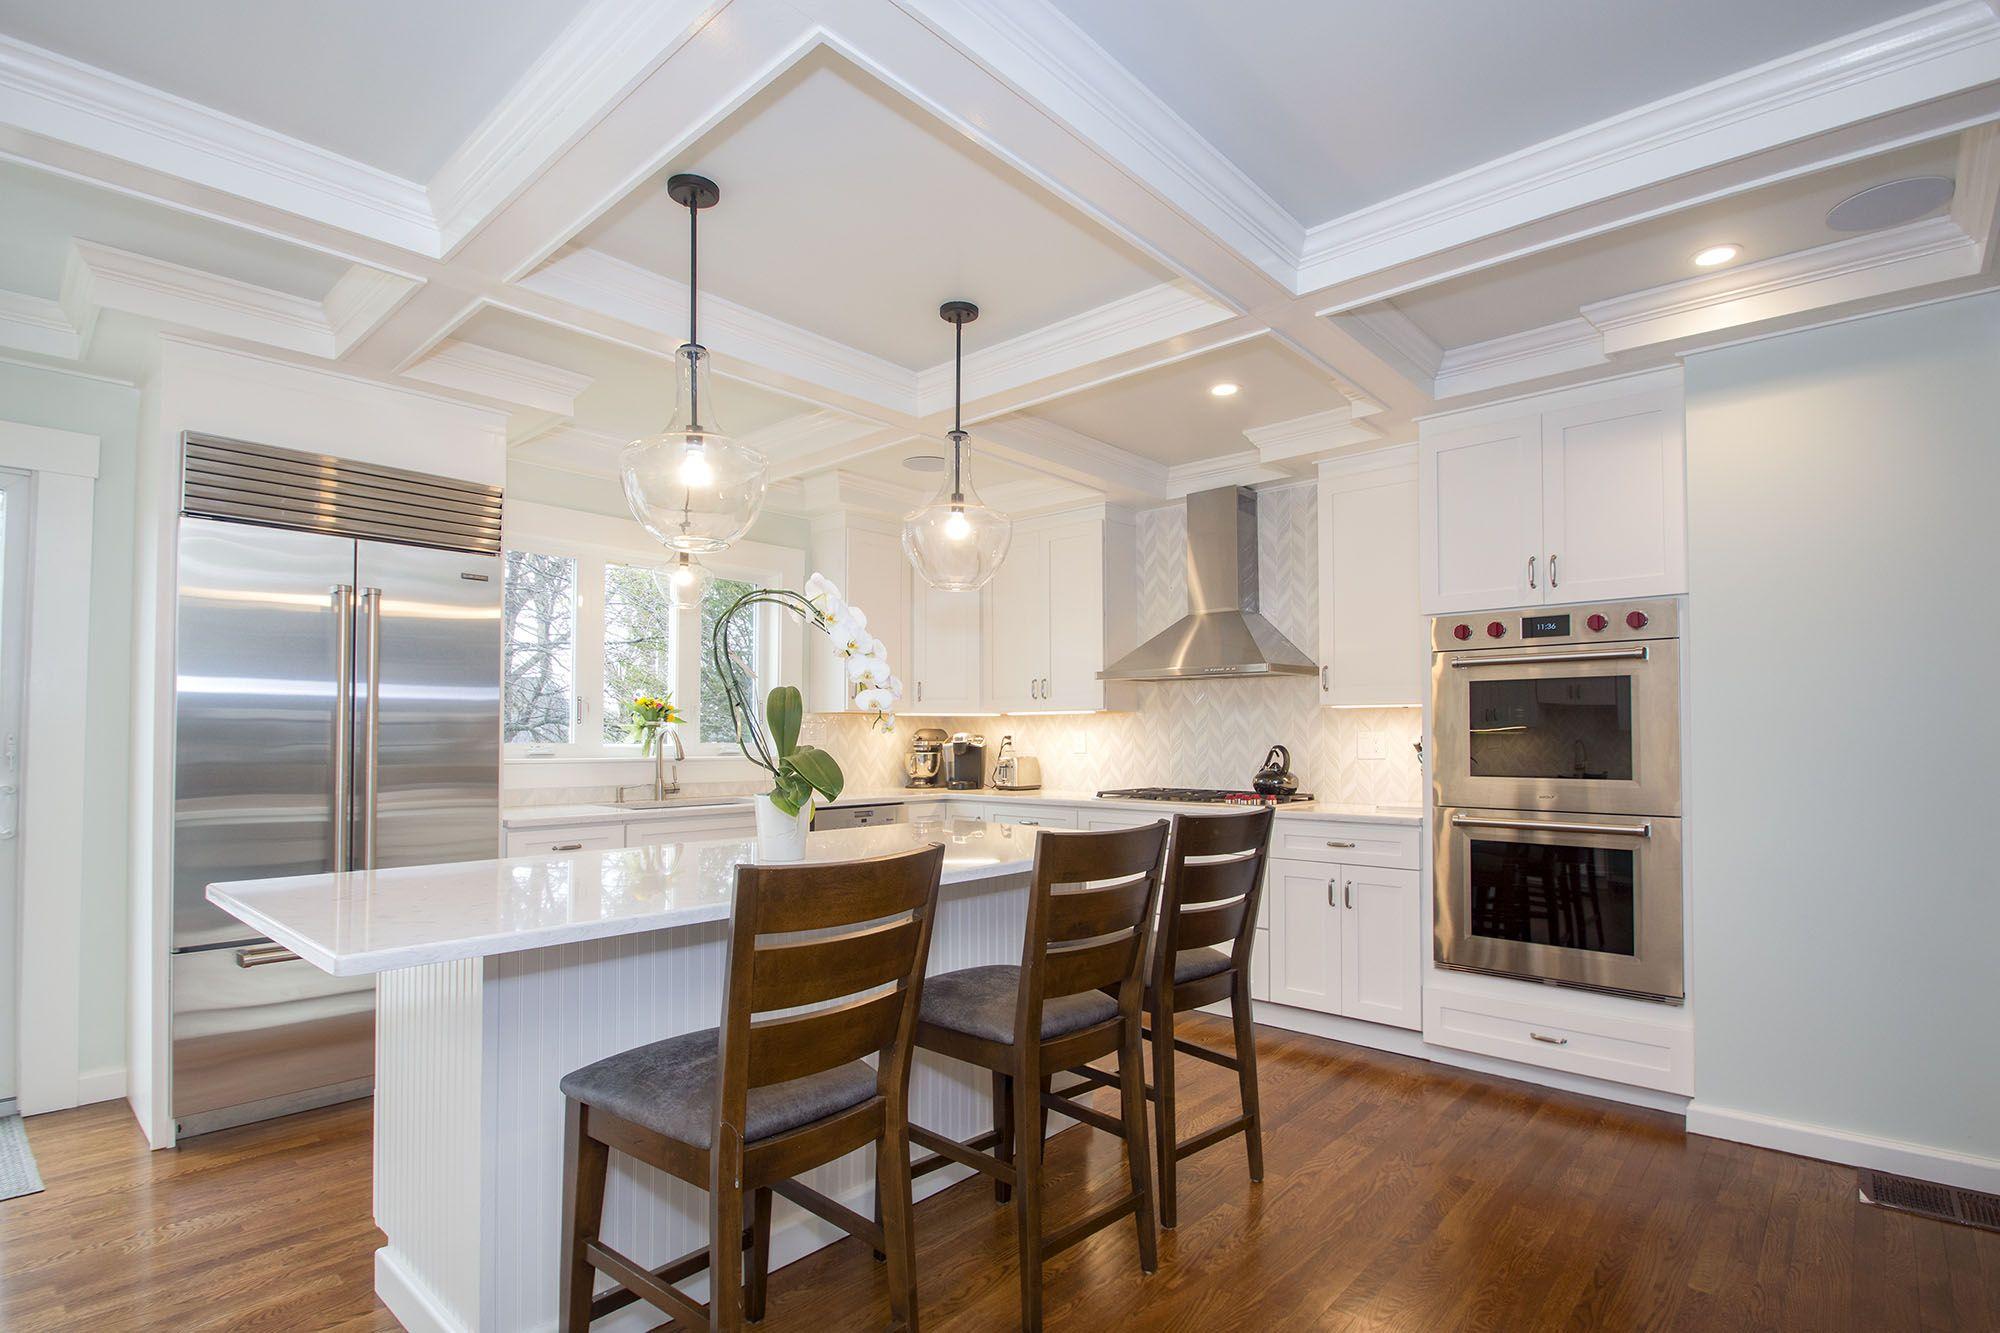 white cabinets, hardwood floors, pendant lights, stainless ...